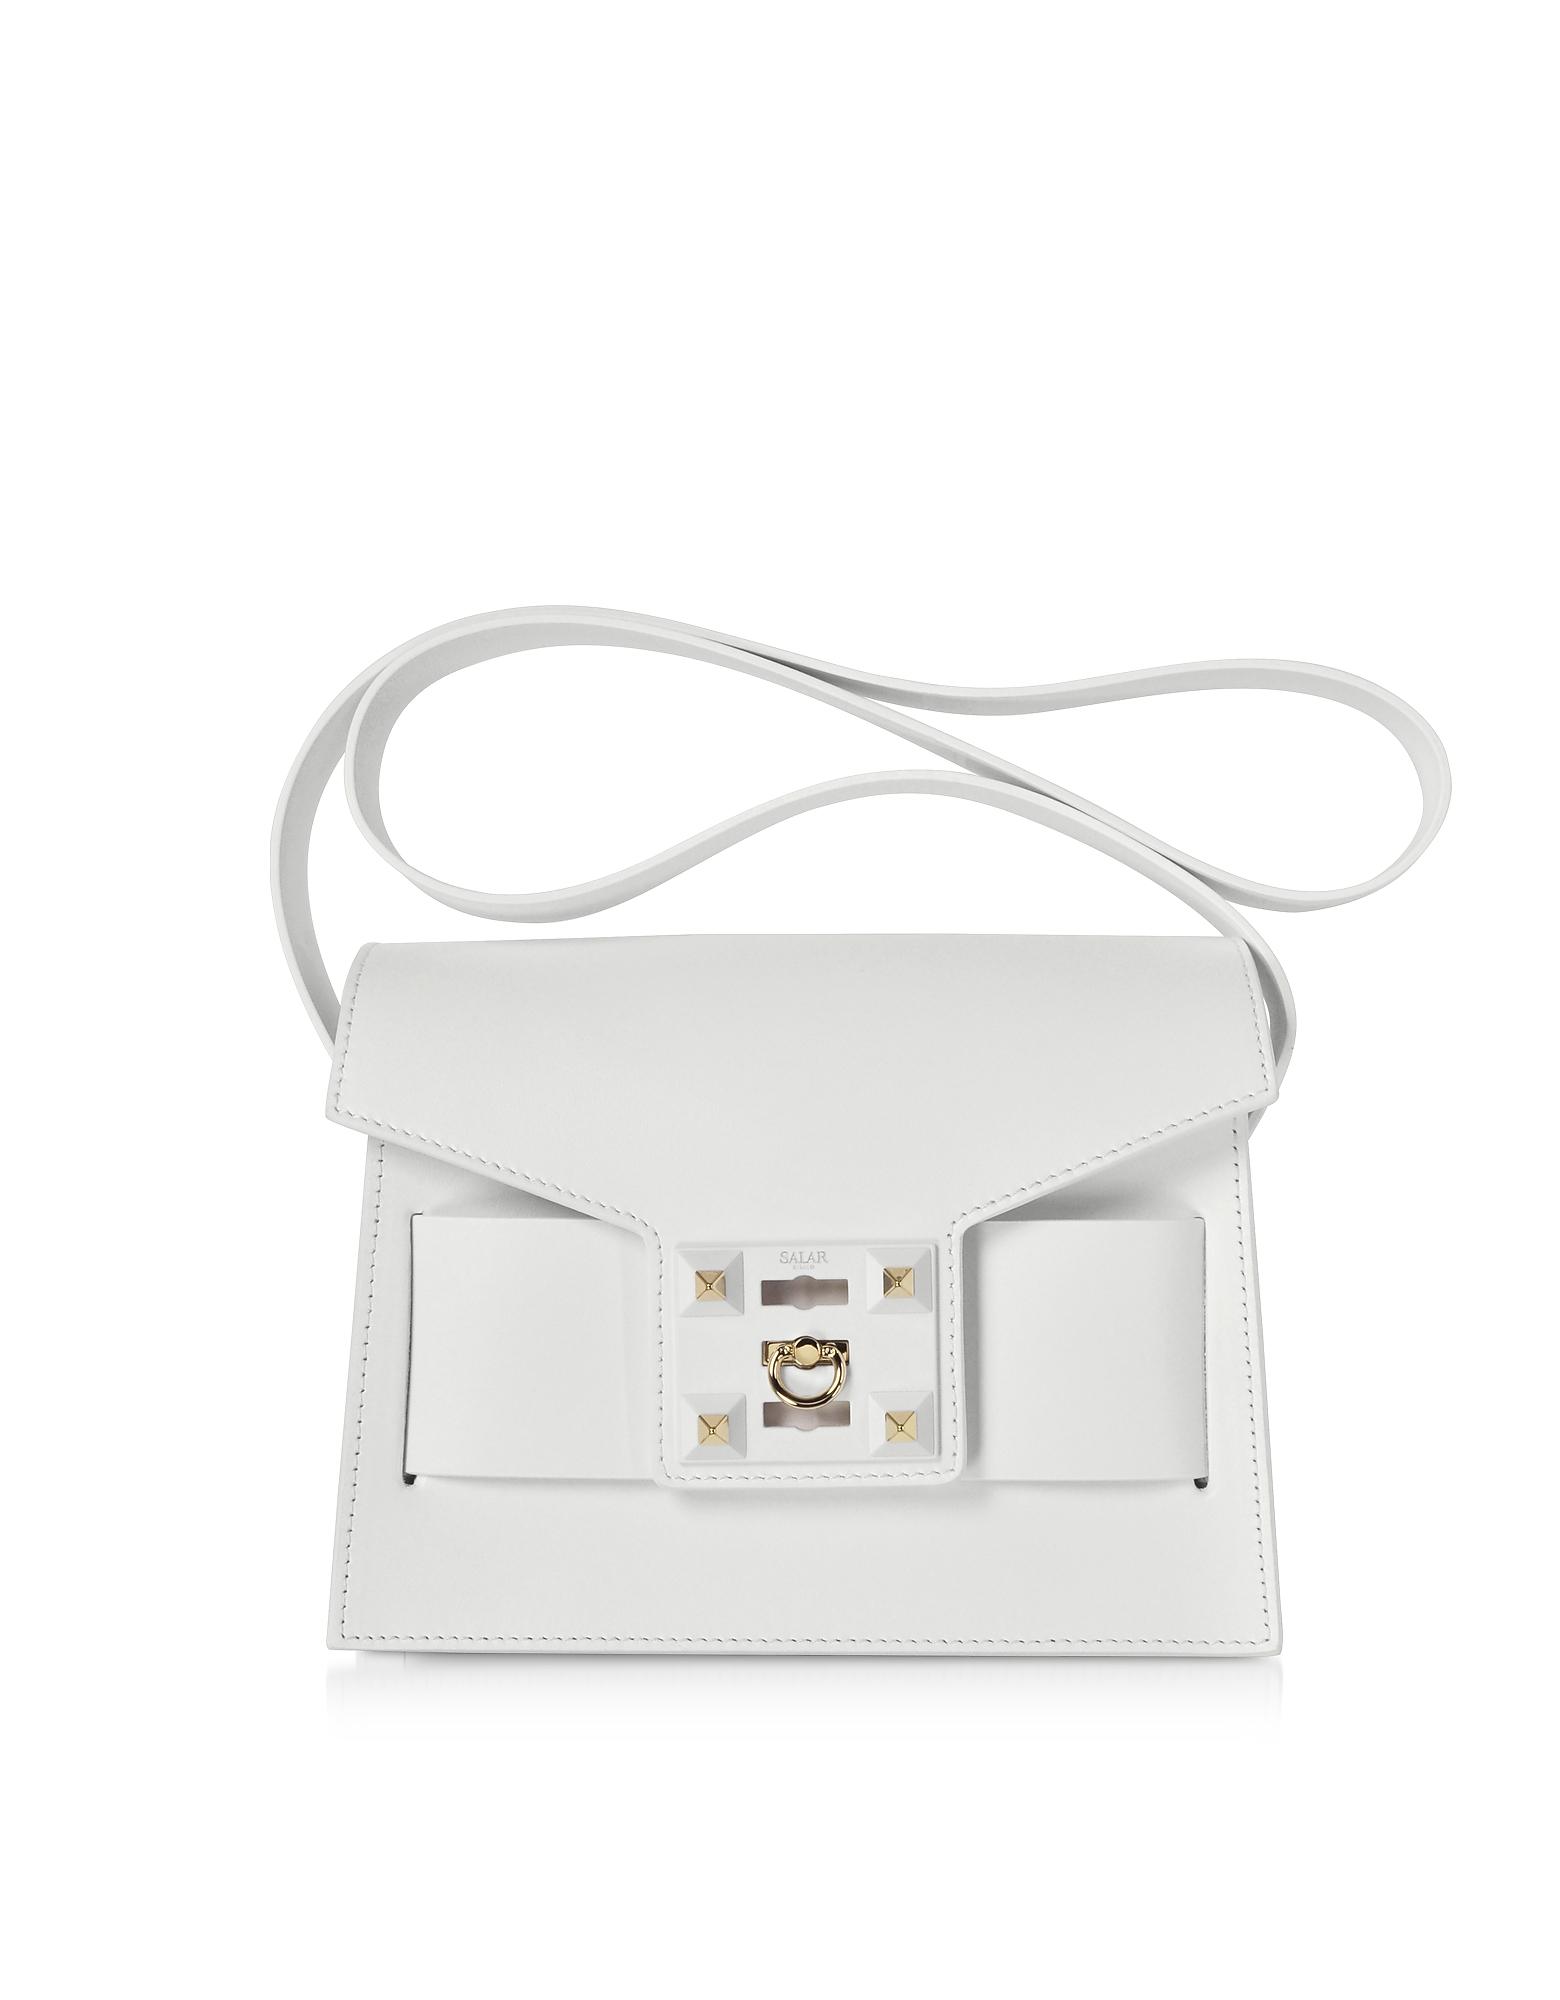 Salar Handbags, Mila Basic Shoulder Bag